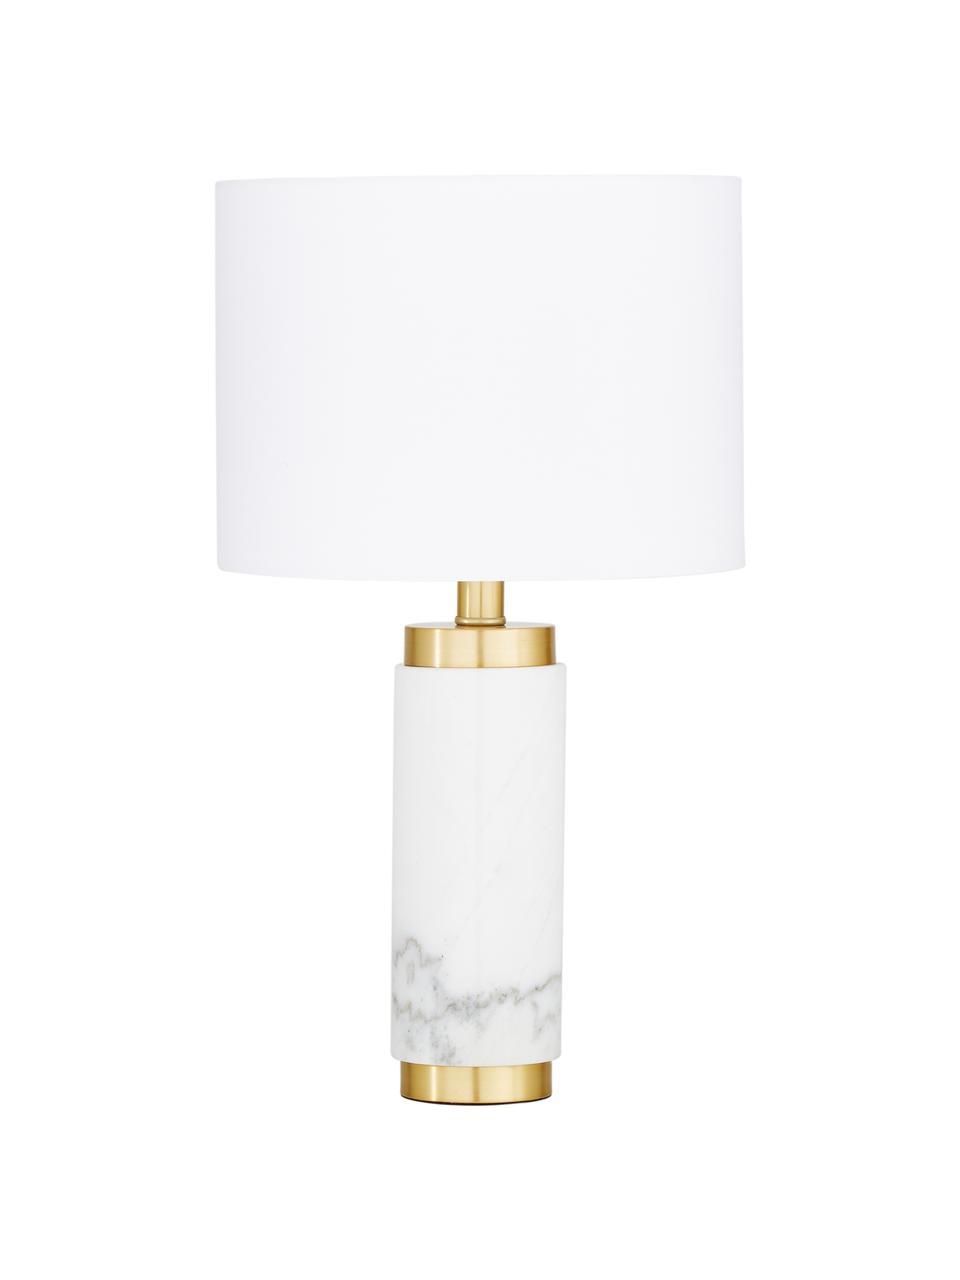 Marmeren tafellamp Miranda, Lampenkap: textiel, Lampvoet: marmer, geborsteld messin, Wit, messingkleurig, Ø 28 x H 48 cm